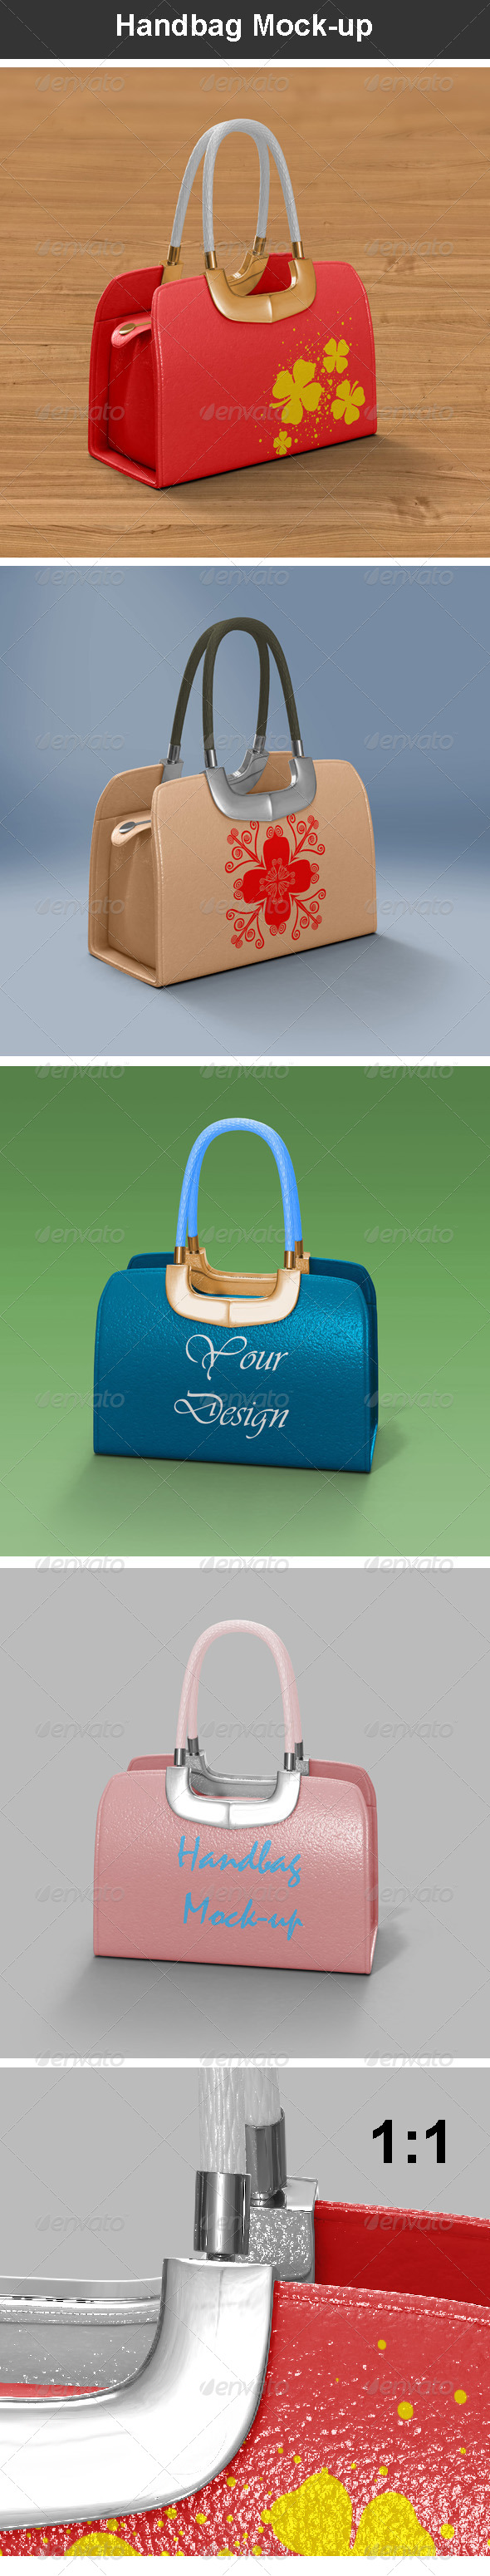 Handbag Mock-up - Miscellaneous Product Mock-Ups